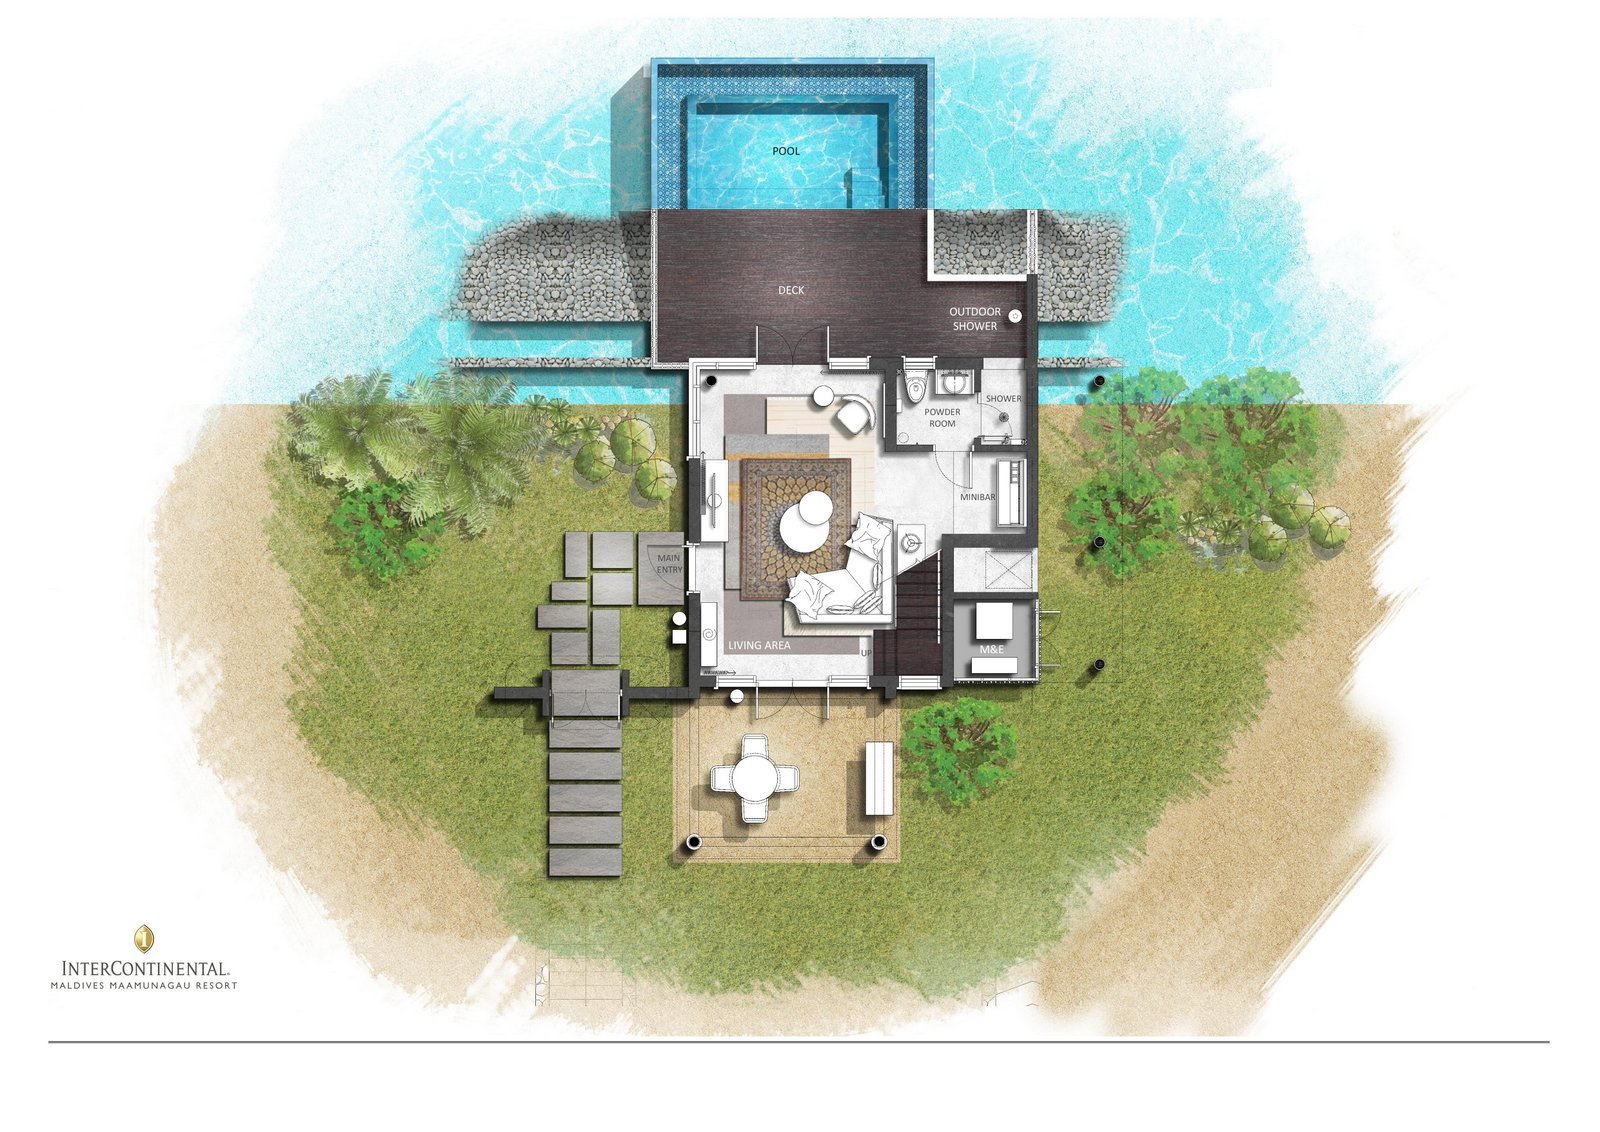 Мальдивы, отель Intercontinental Maldives Maamunagau, план-схема номера Two Bedroom Family Lagoon Pool Villa